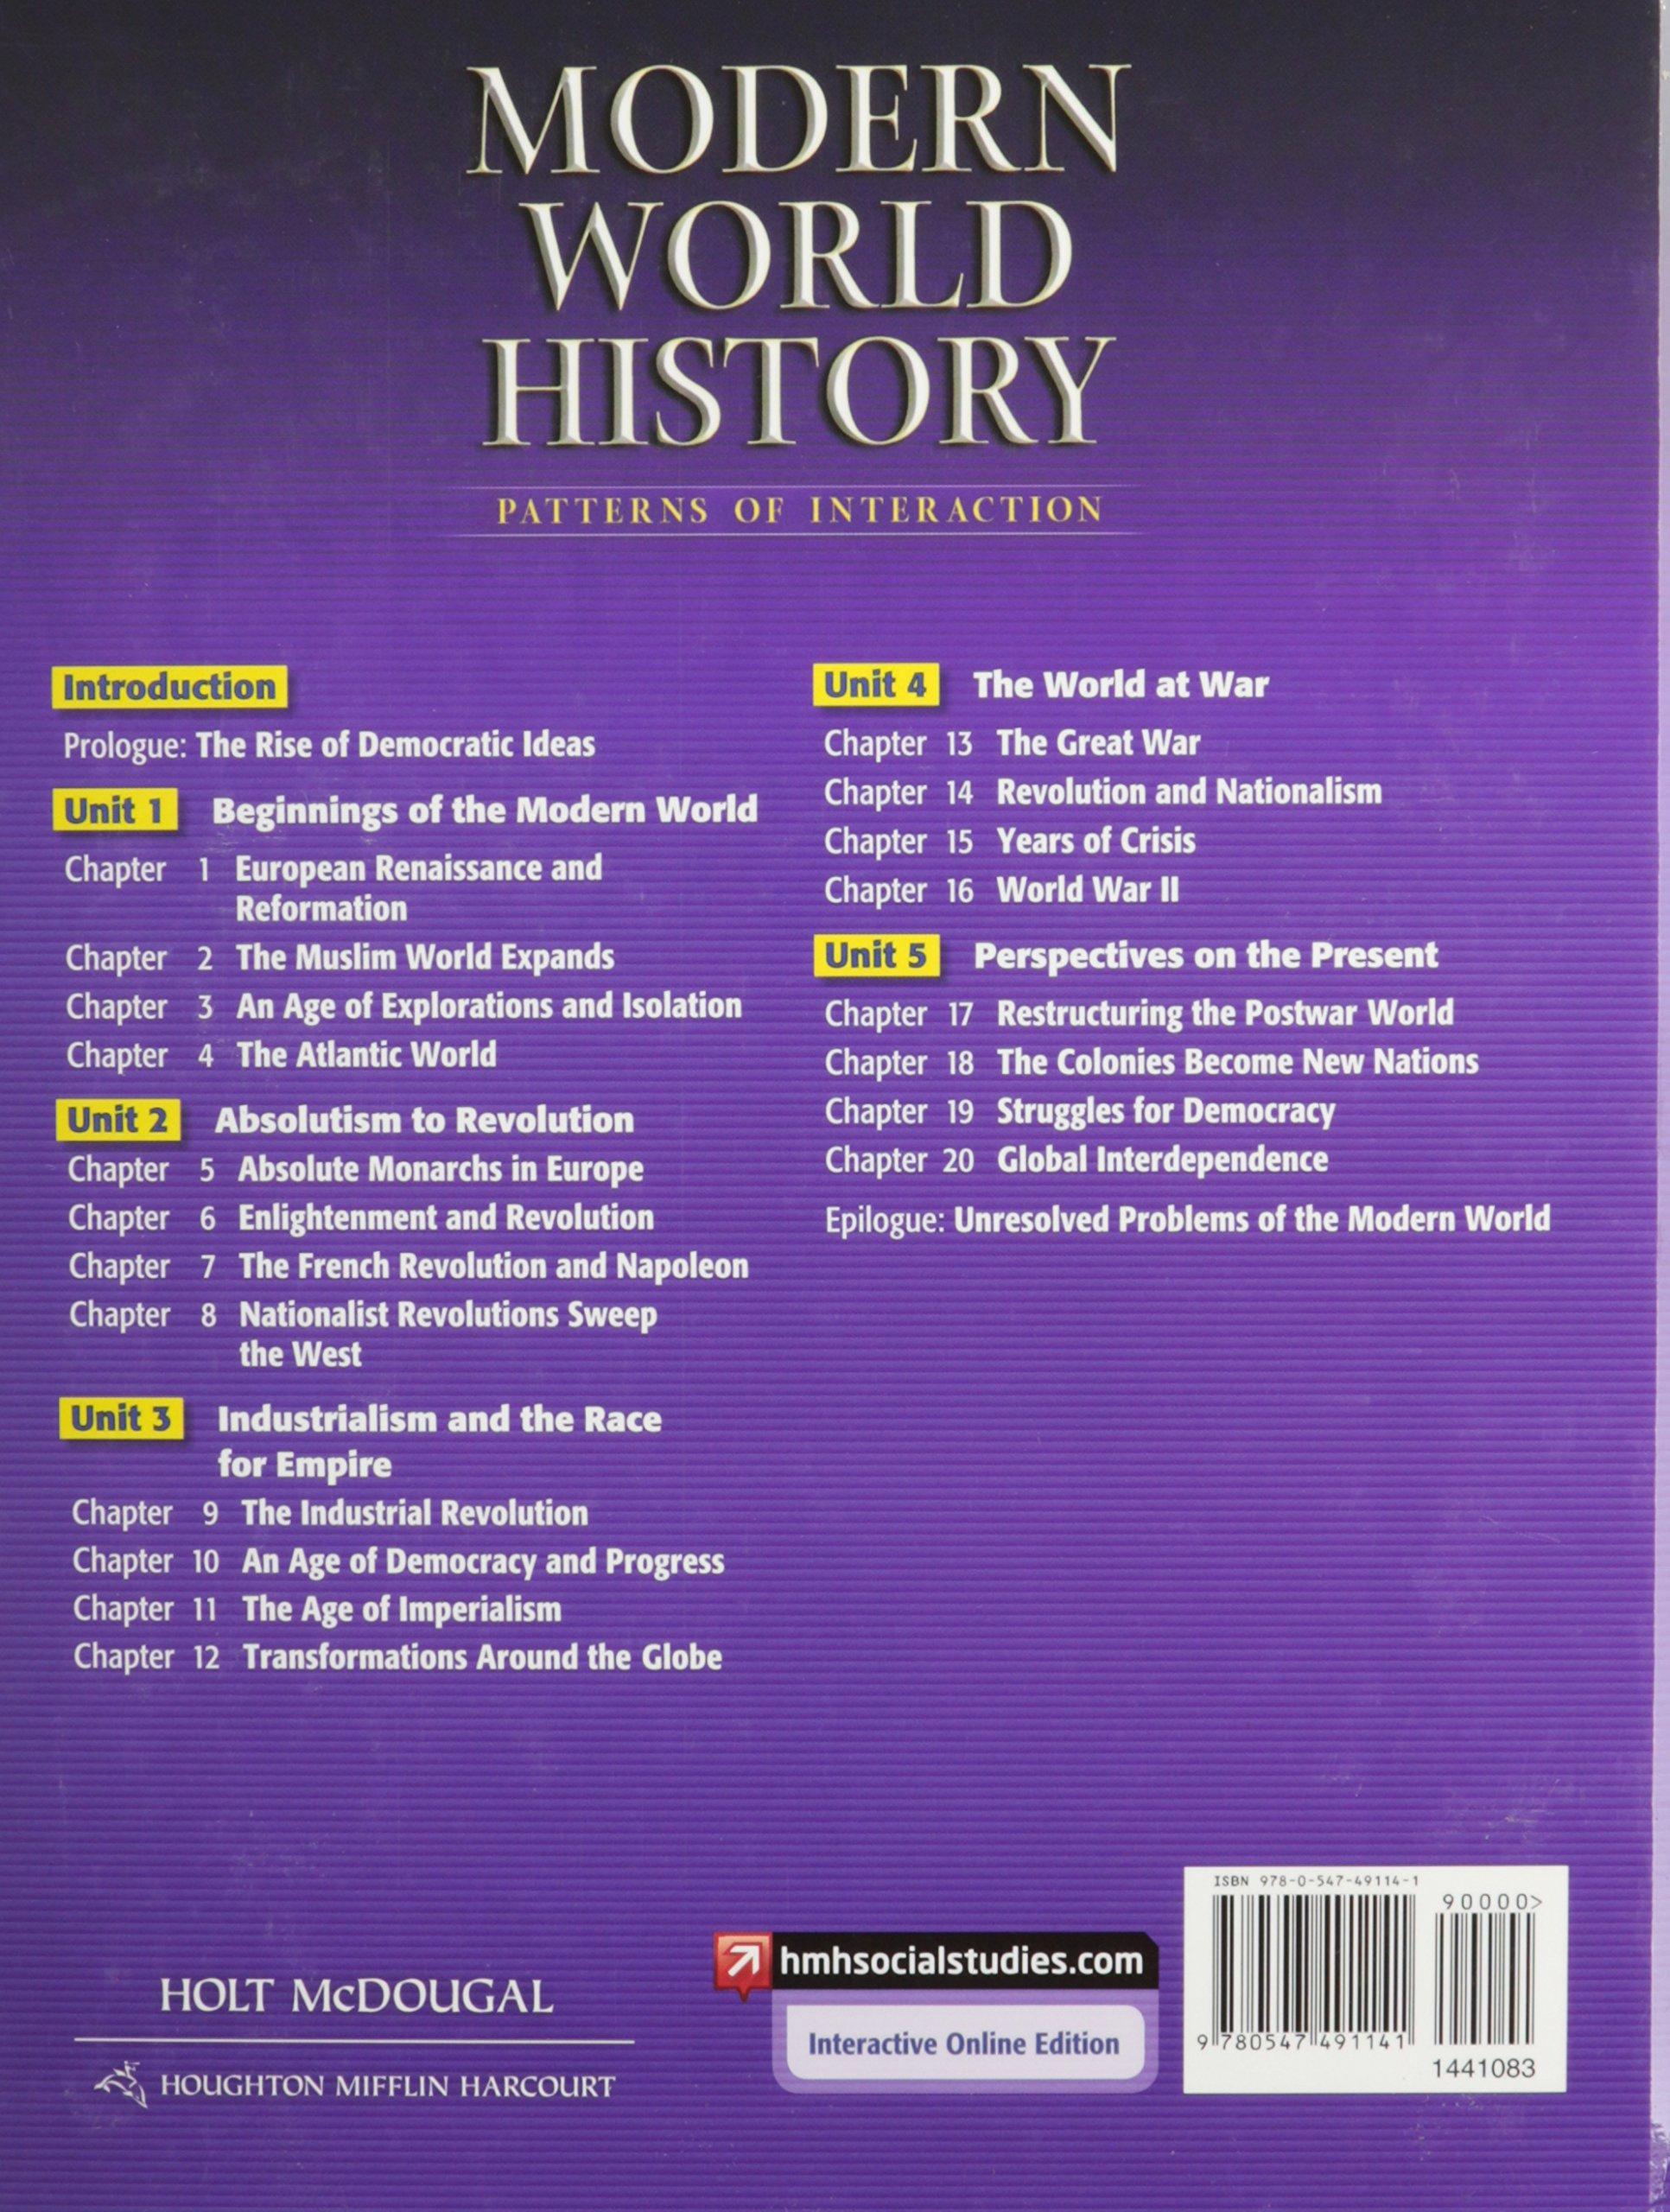 Modern World History Textbook Holt Mcdougal Pdf